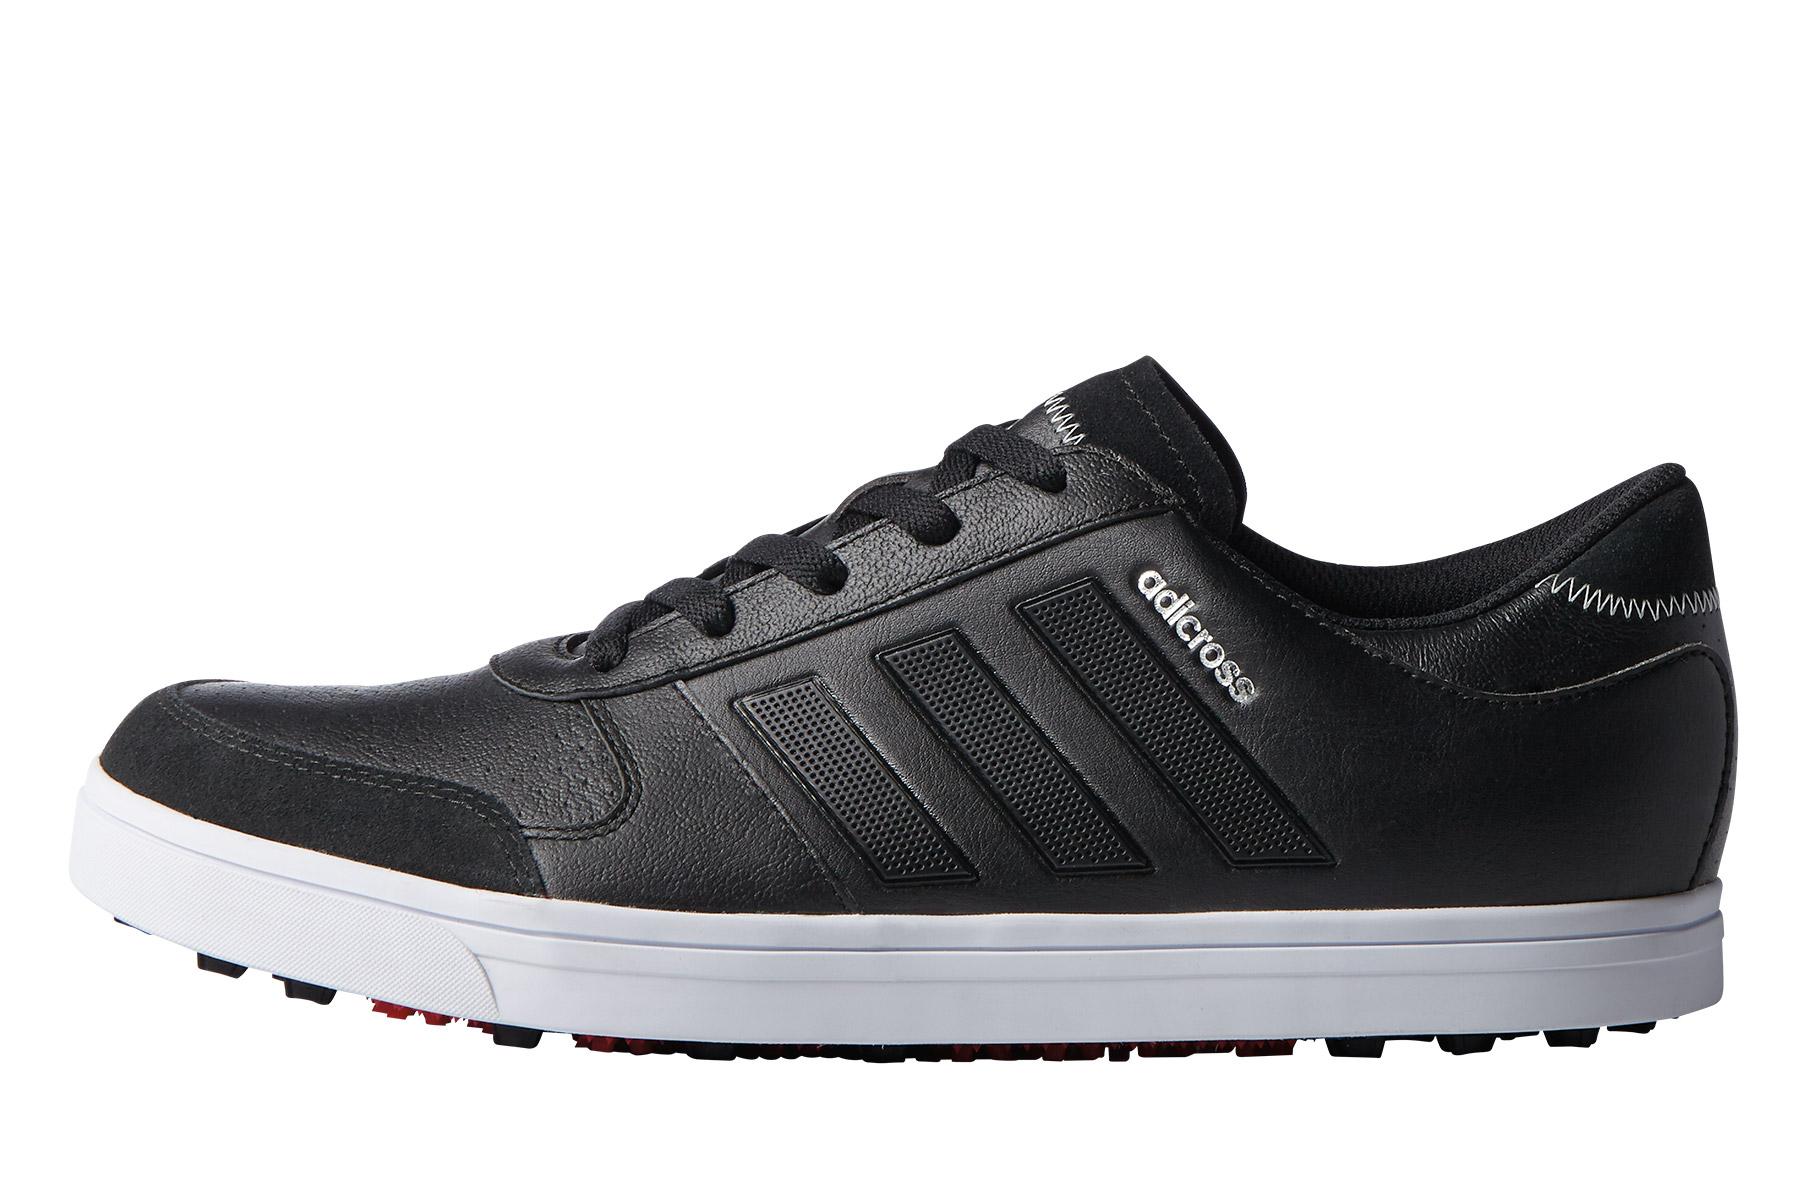 Adidas Gripmore Golf Shoes Uk